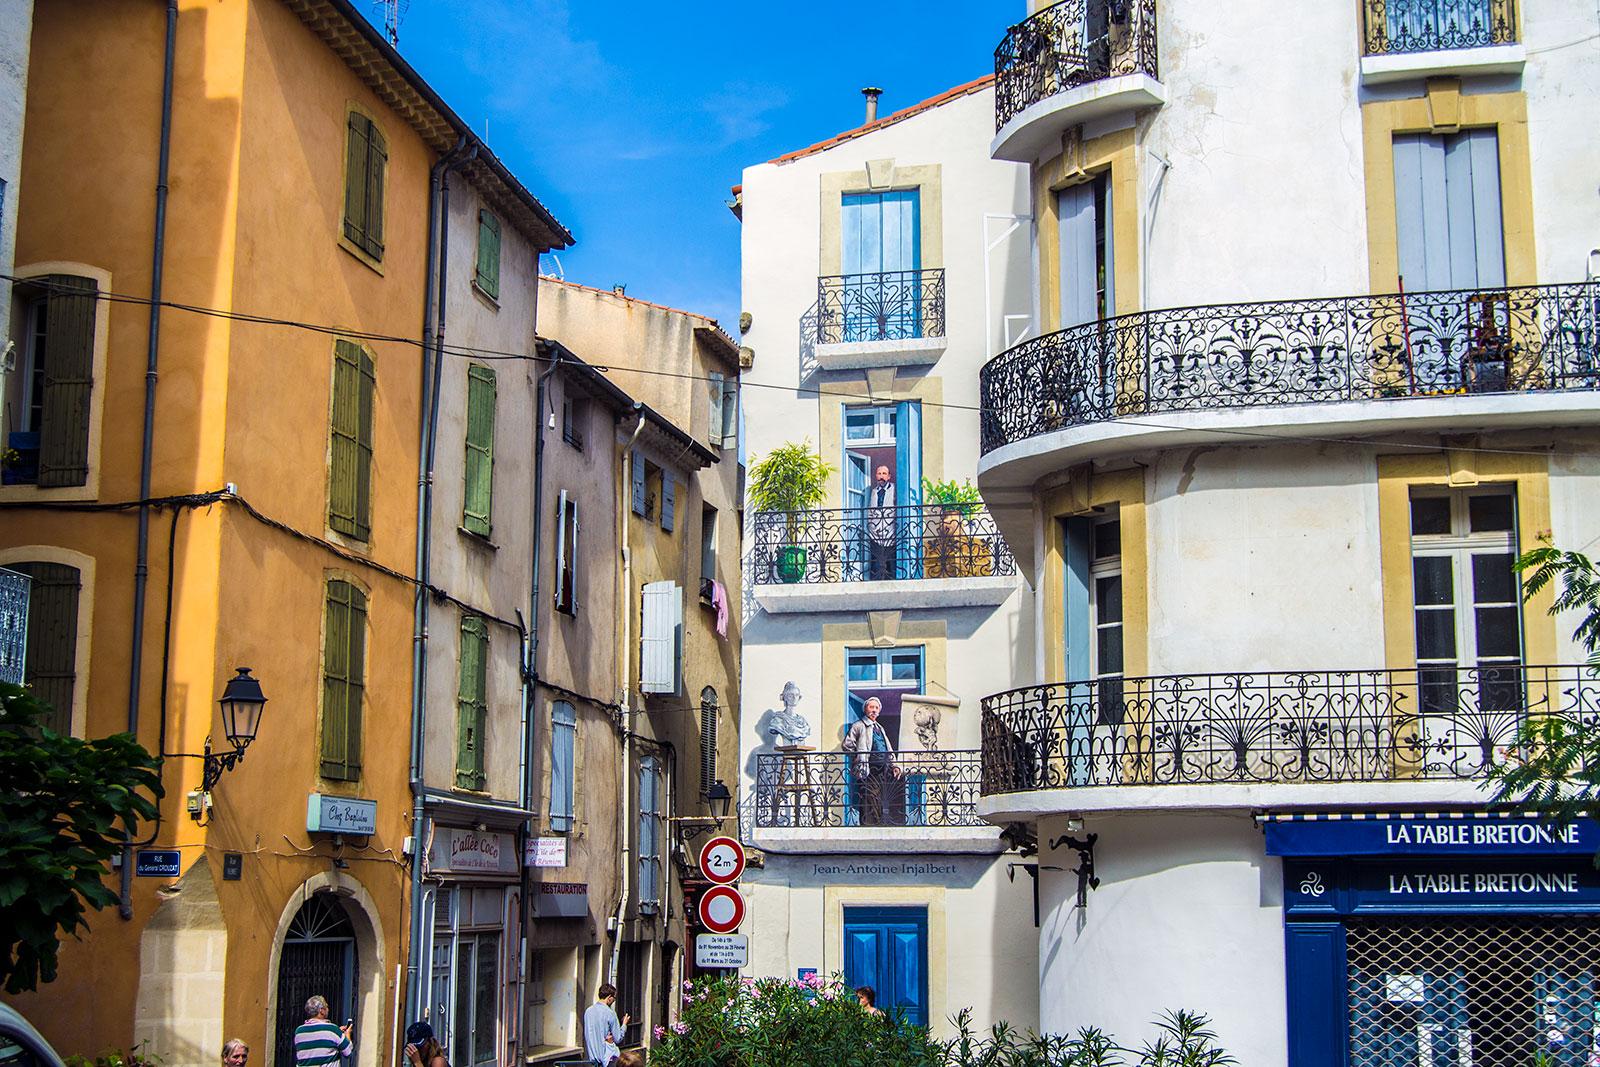 Fachada en Béziers - Aix en Provence y Béziers